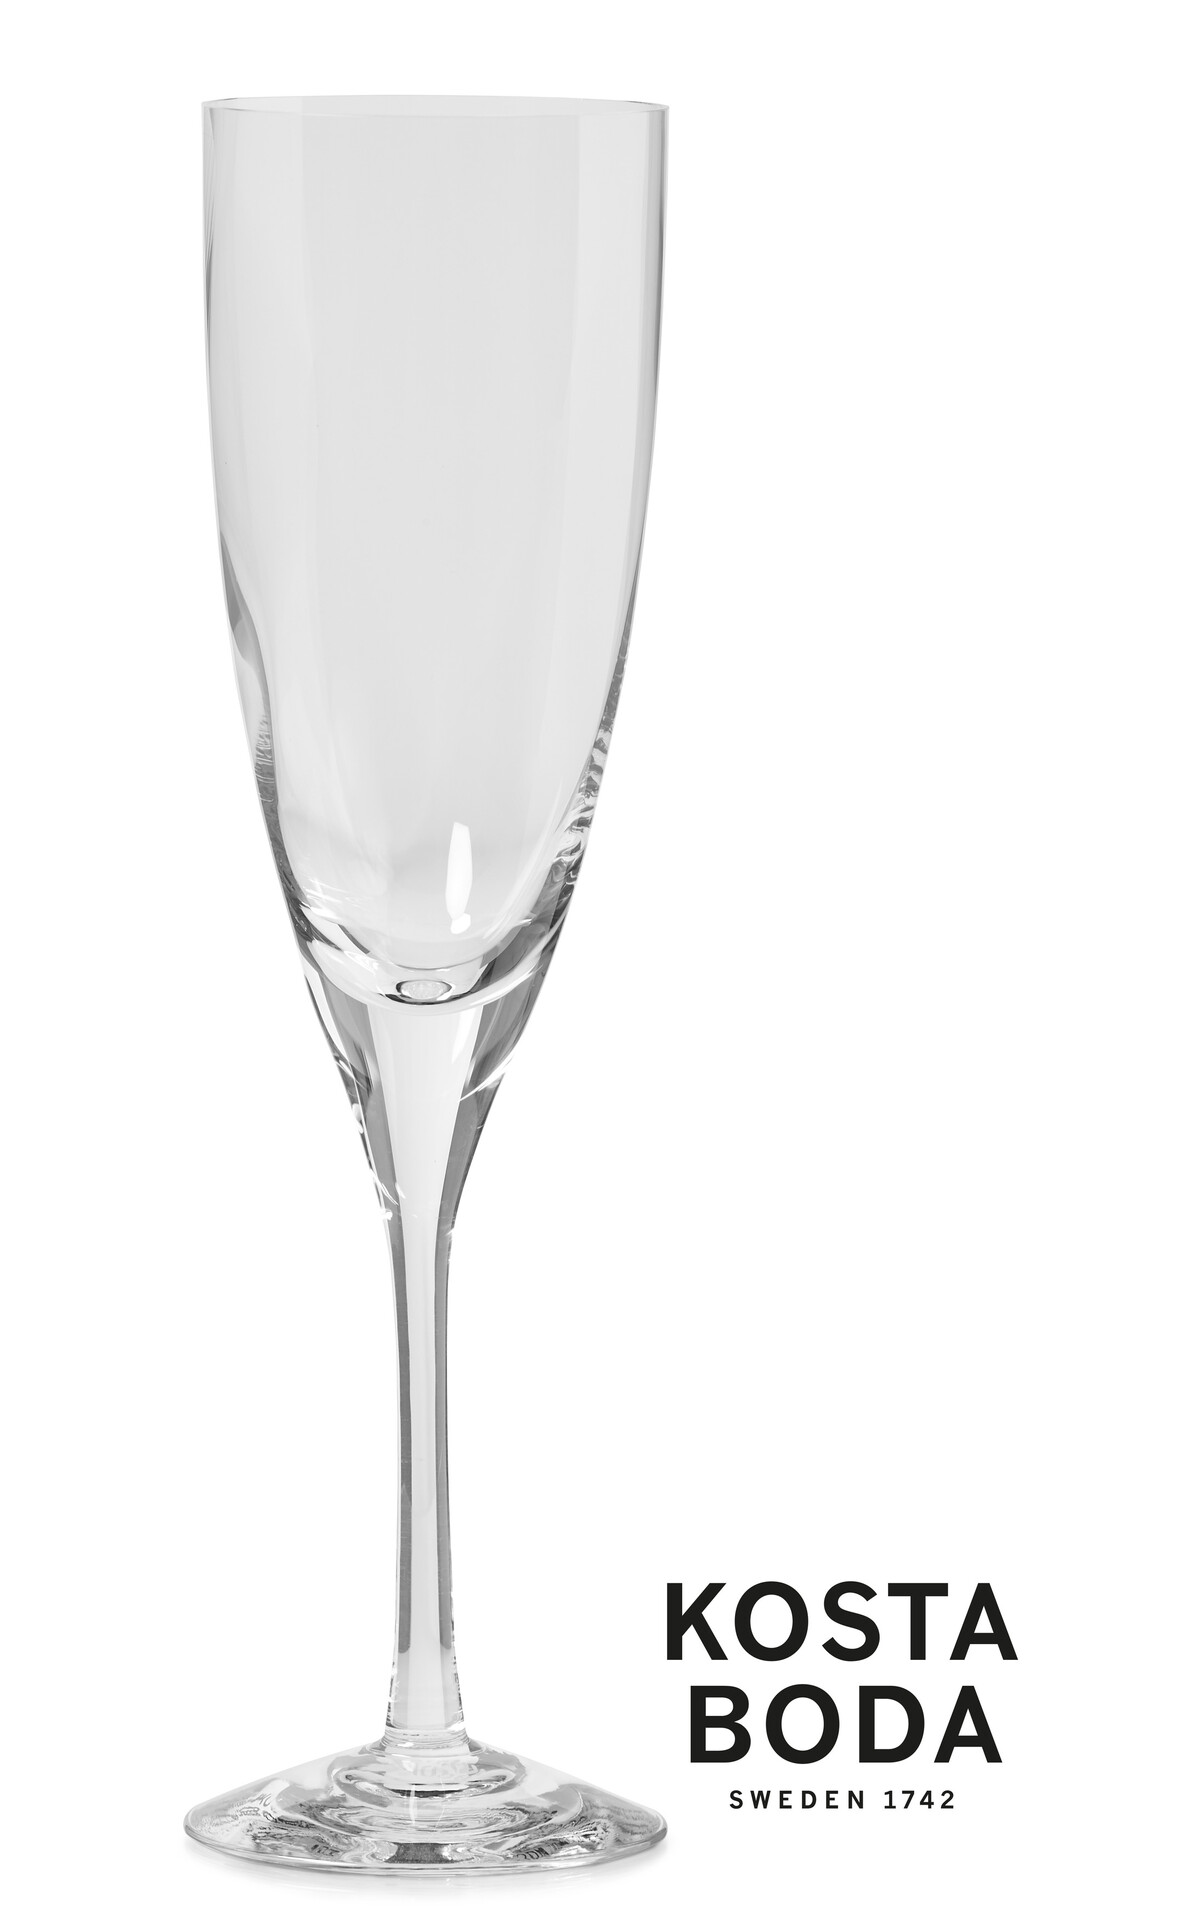 Ungdommelige Chateau Champagneglas | Glas/Porslin/Husgeråd | Mio OU16